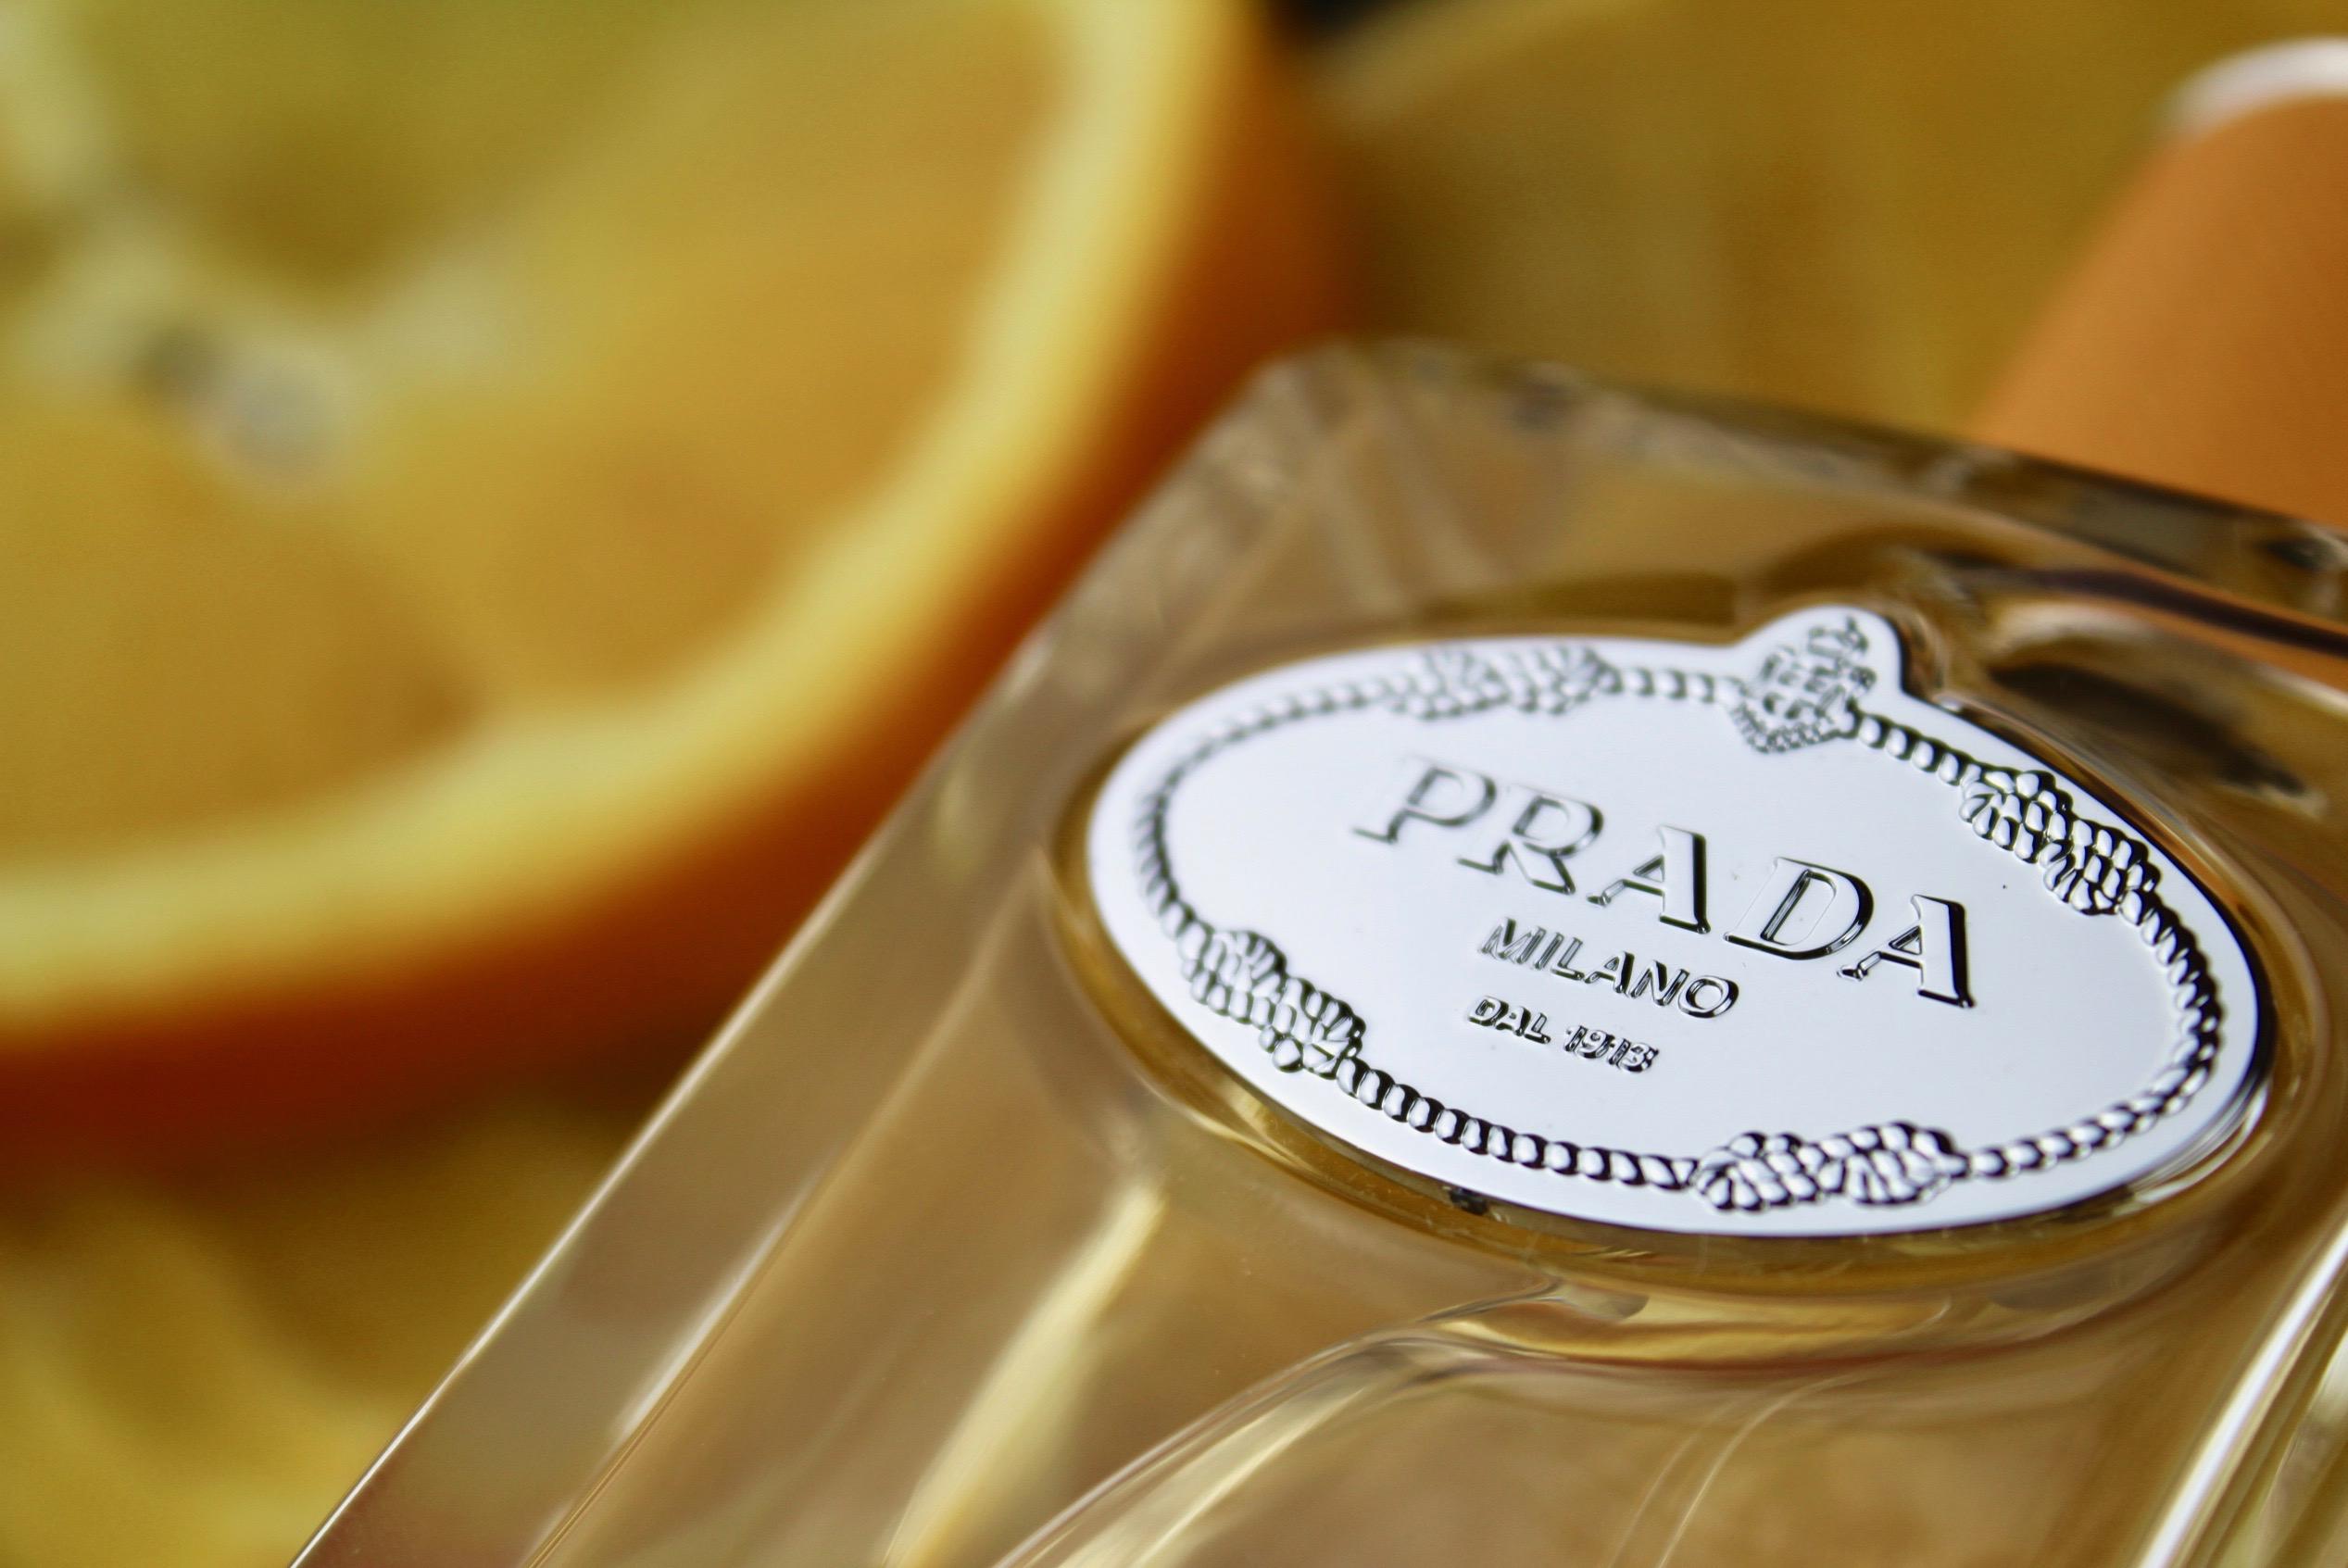 Boy – By Prada De Candy Perfume ReviewInfusion The Mandarine QohdCBtrsx